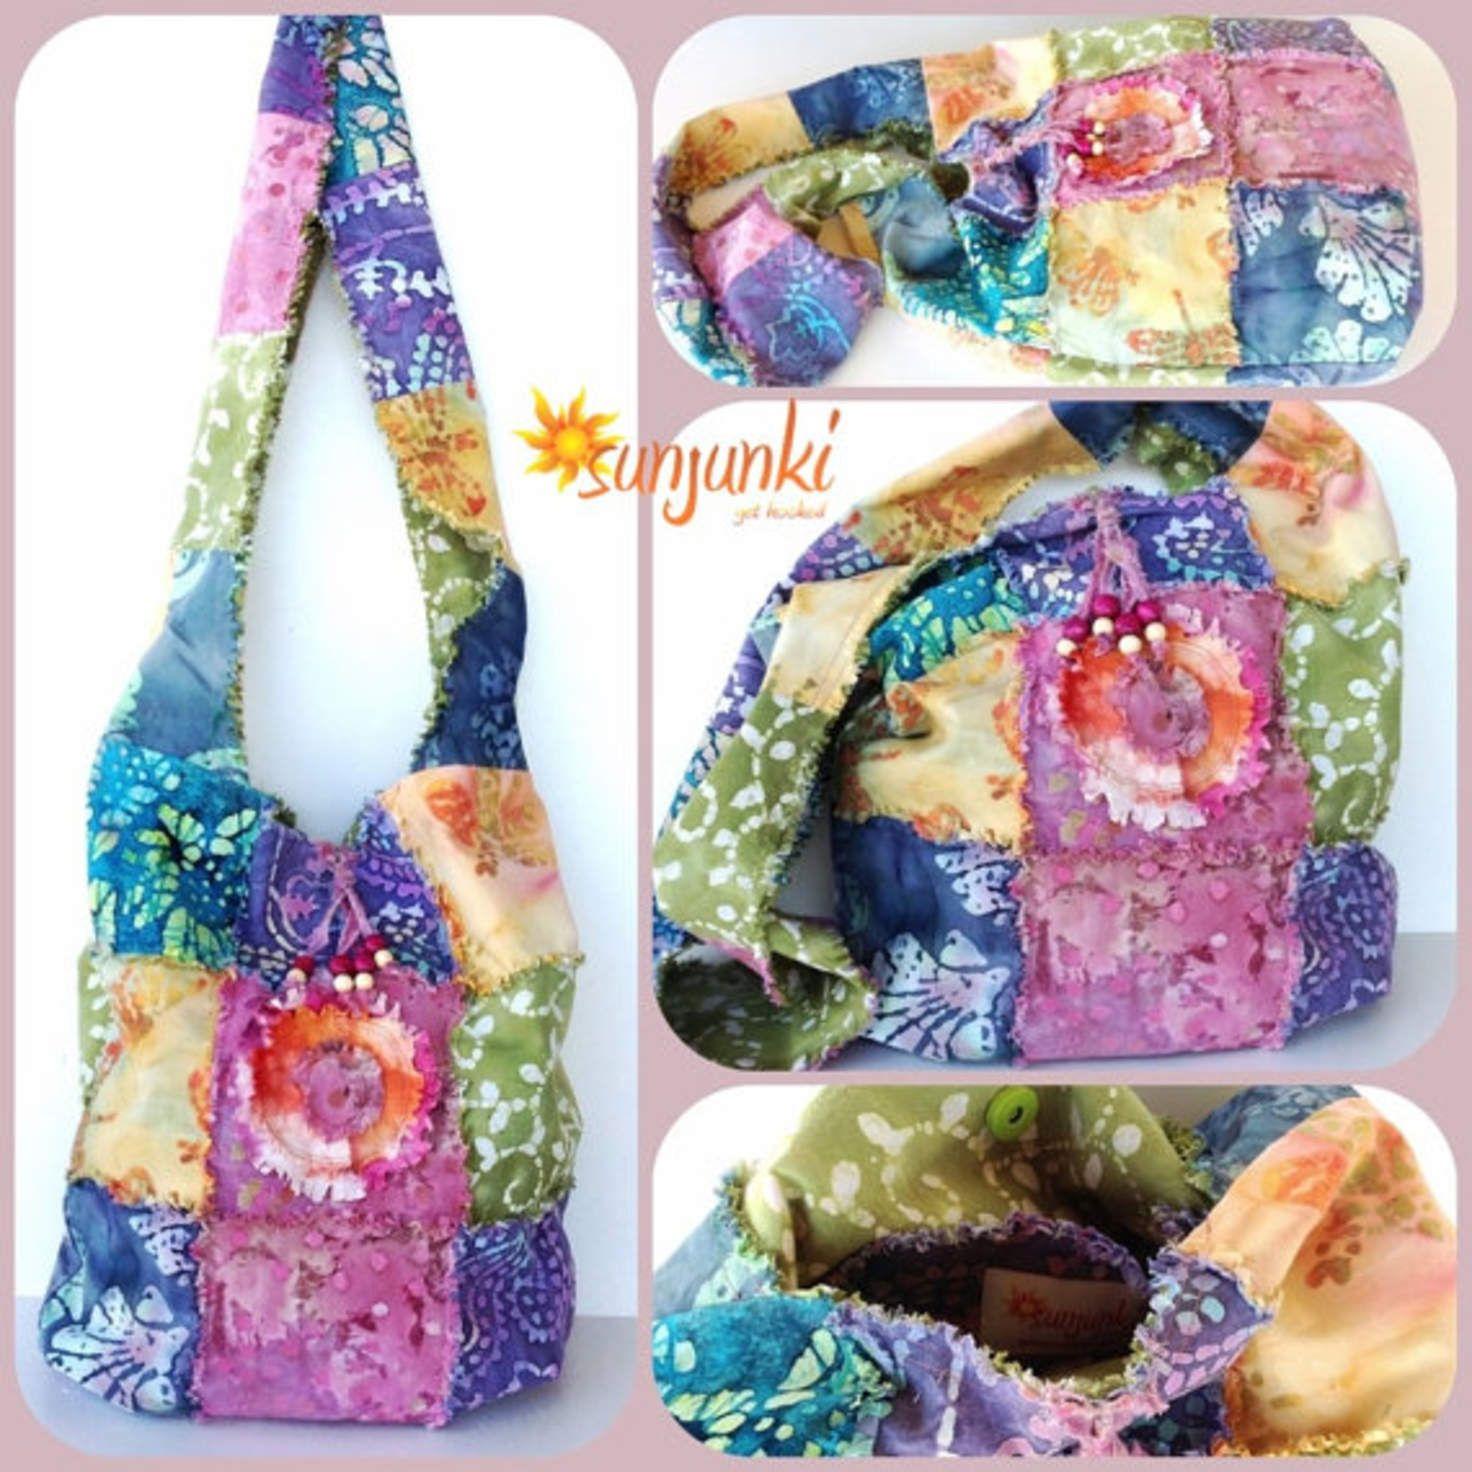 Hippy Satchel, Hobo Bag, One Of A Kind, School Bag, Shoulder Bag, Purse, Beach Bag, Diaper Bag, Hippie, Gypsy, Travel, Tie Dye Bag